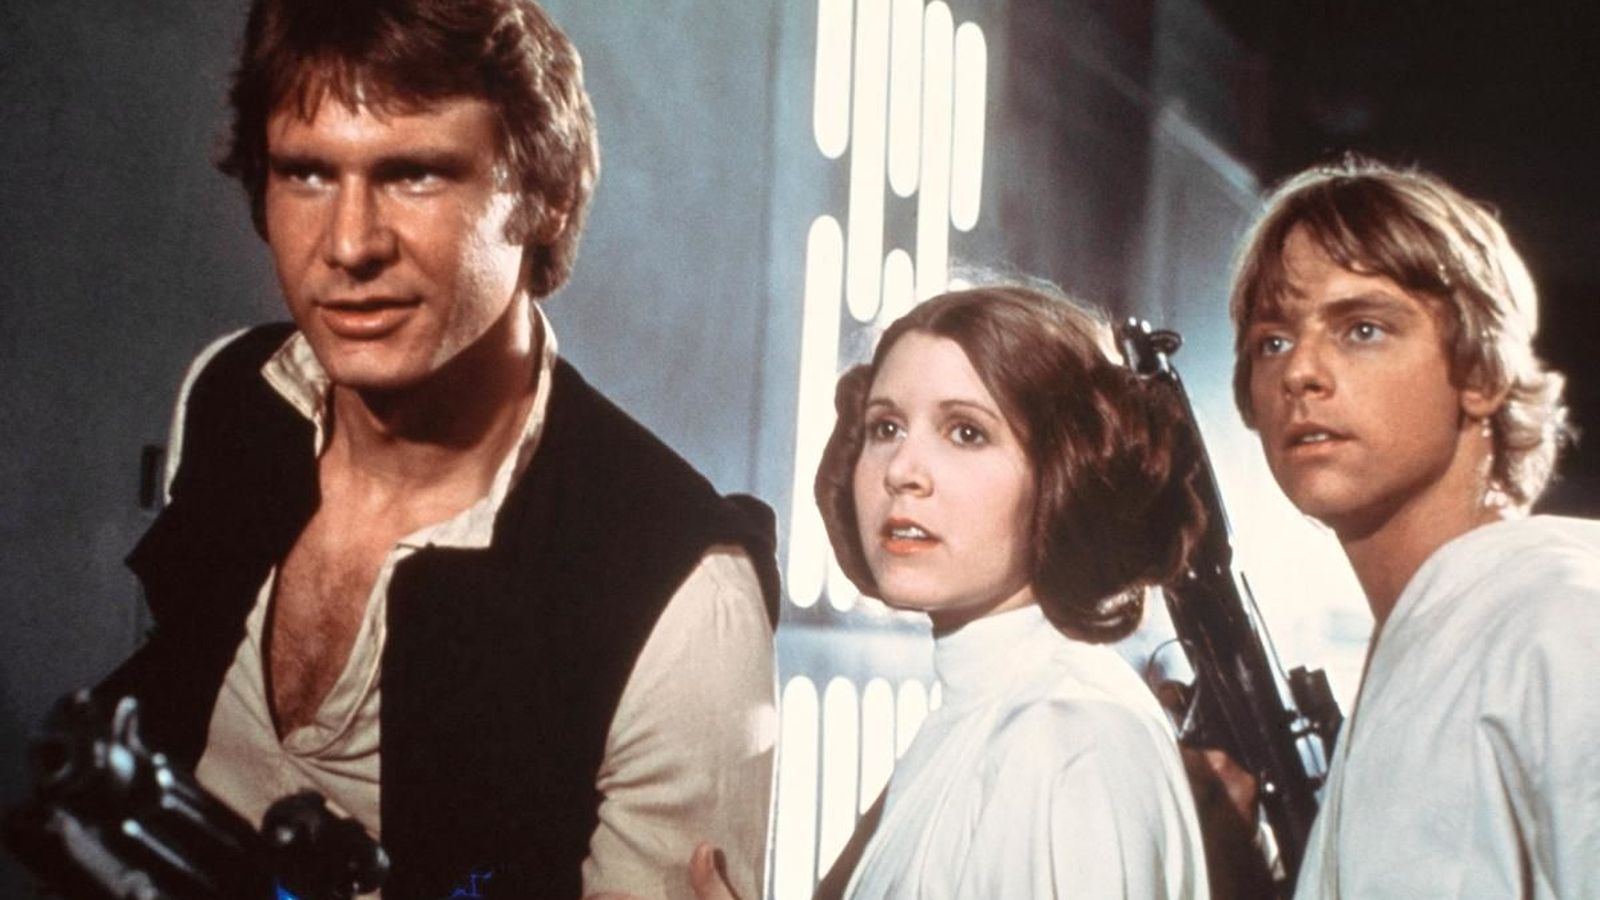 Foto: Harrisond Ford, Carrie Fisher y Mark Hamill en la película original de 1977.